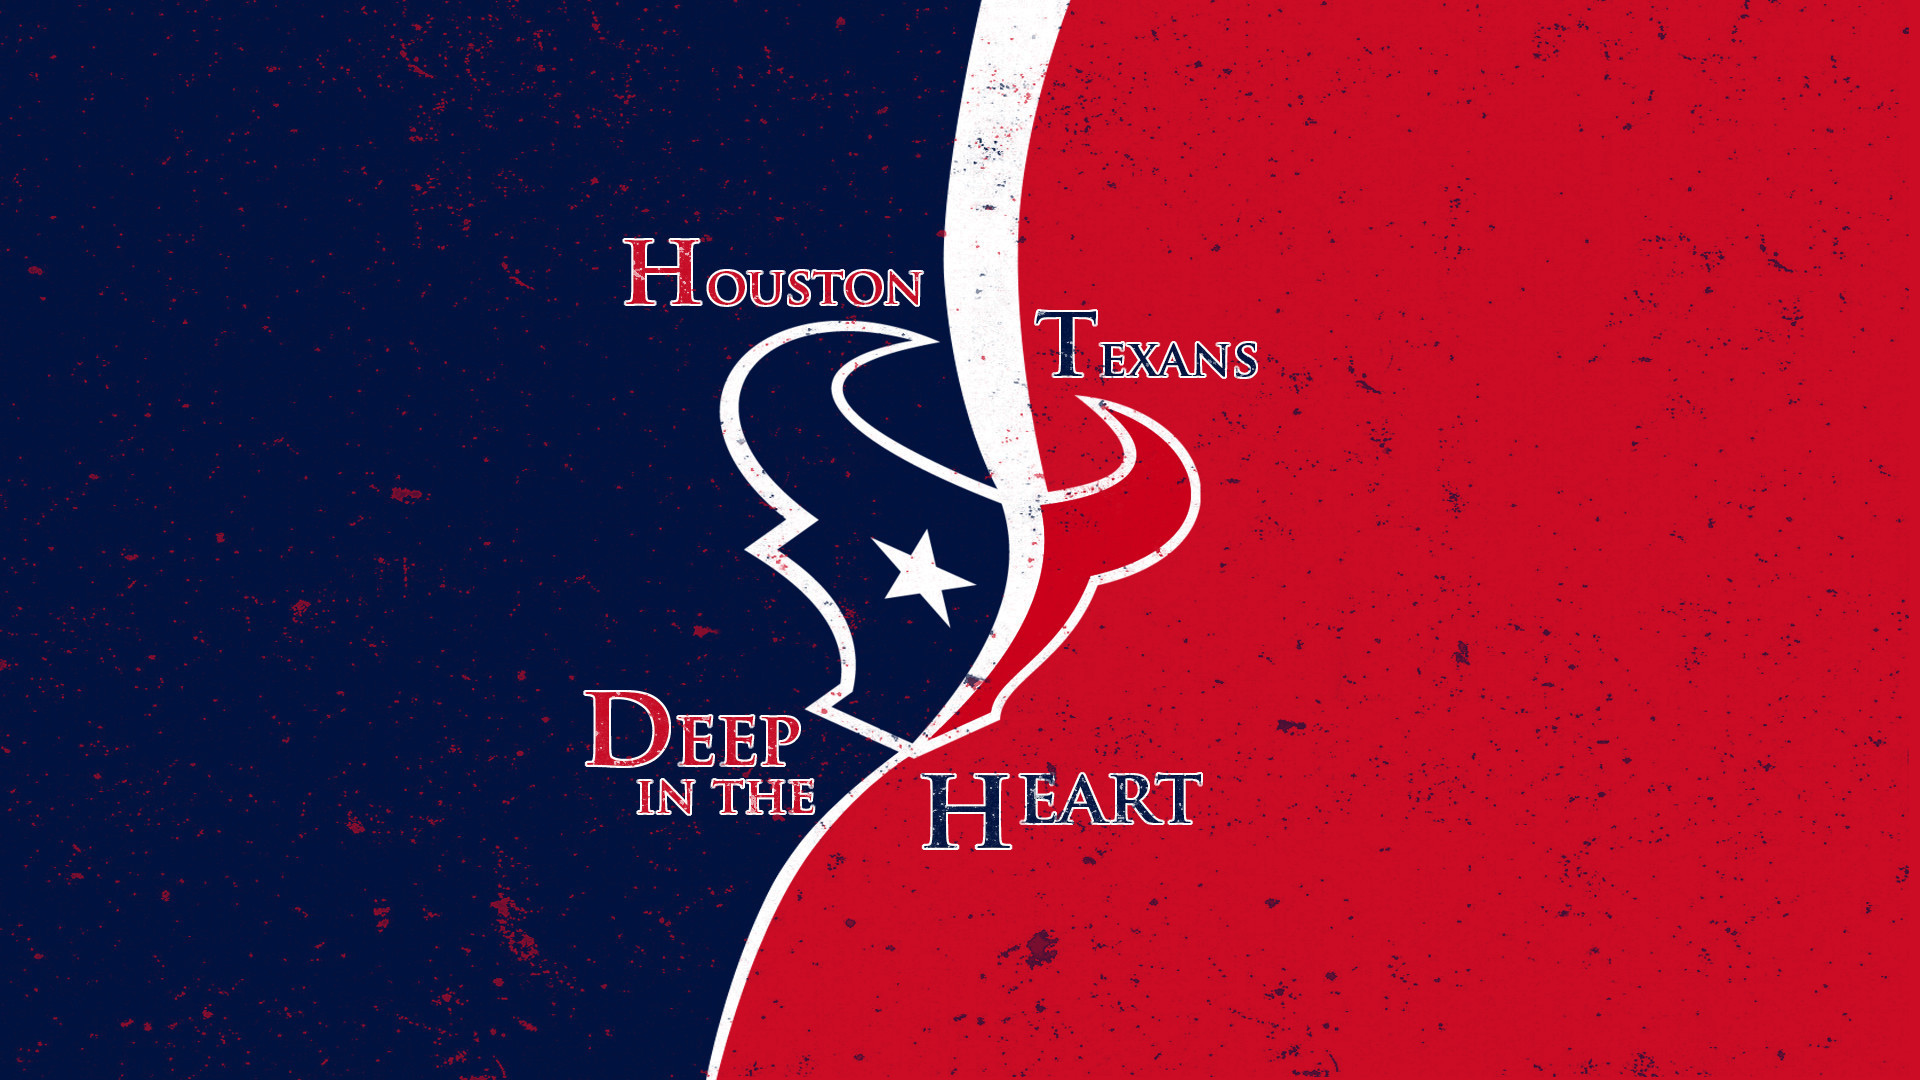 Houston Texans HD Wallpaper 1920×1080